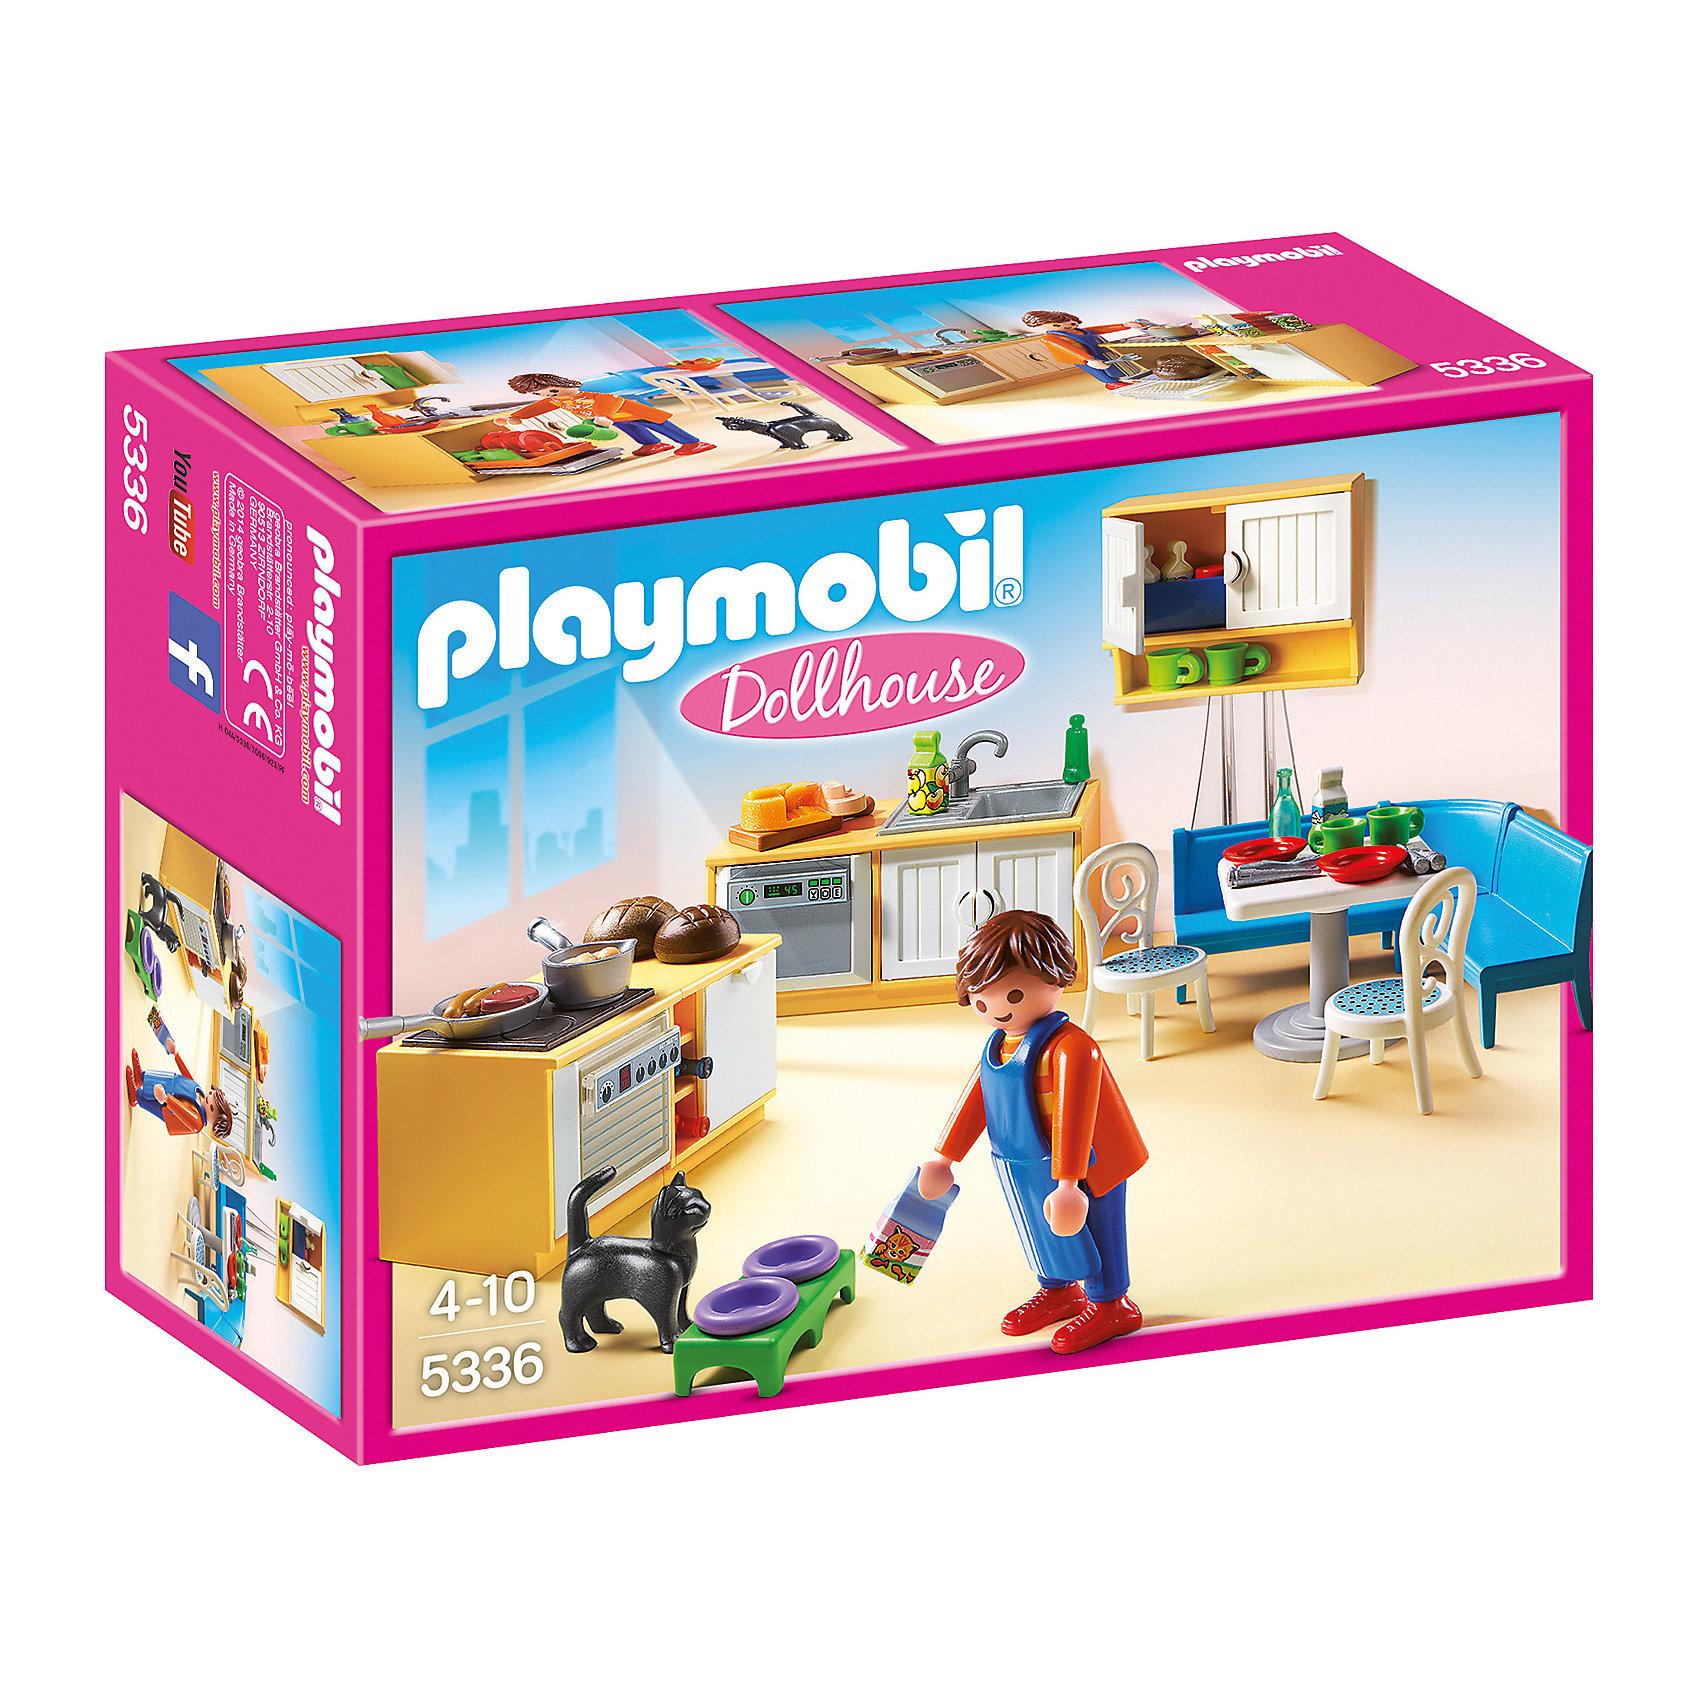 PLAYMOBIL® Встроенная кухня с зоной отдыха, PLAYMOBIL playmobil® встроенная кухня с зоной отдыха playmobil